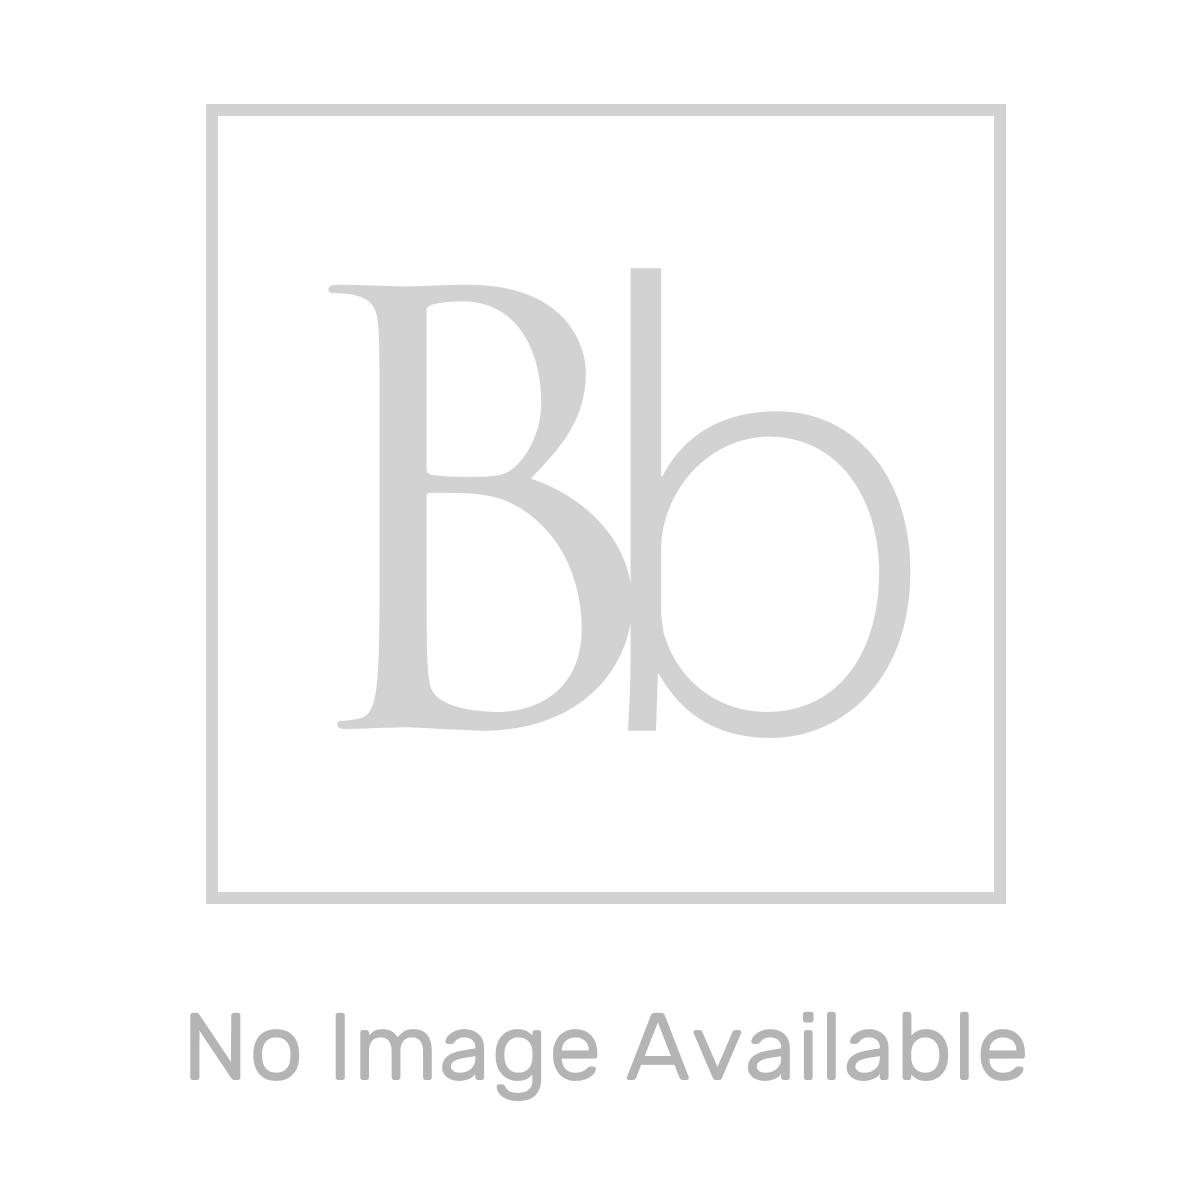 RAK Series 600 Bathroom Suite with Pacific Walk-In Shower Enclosure